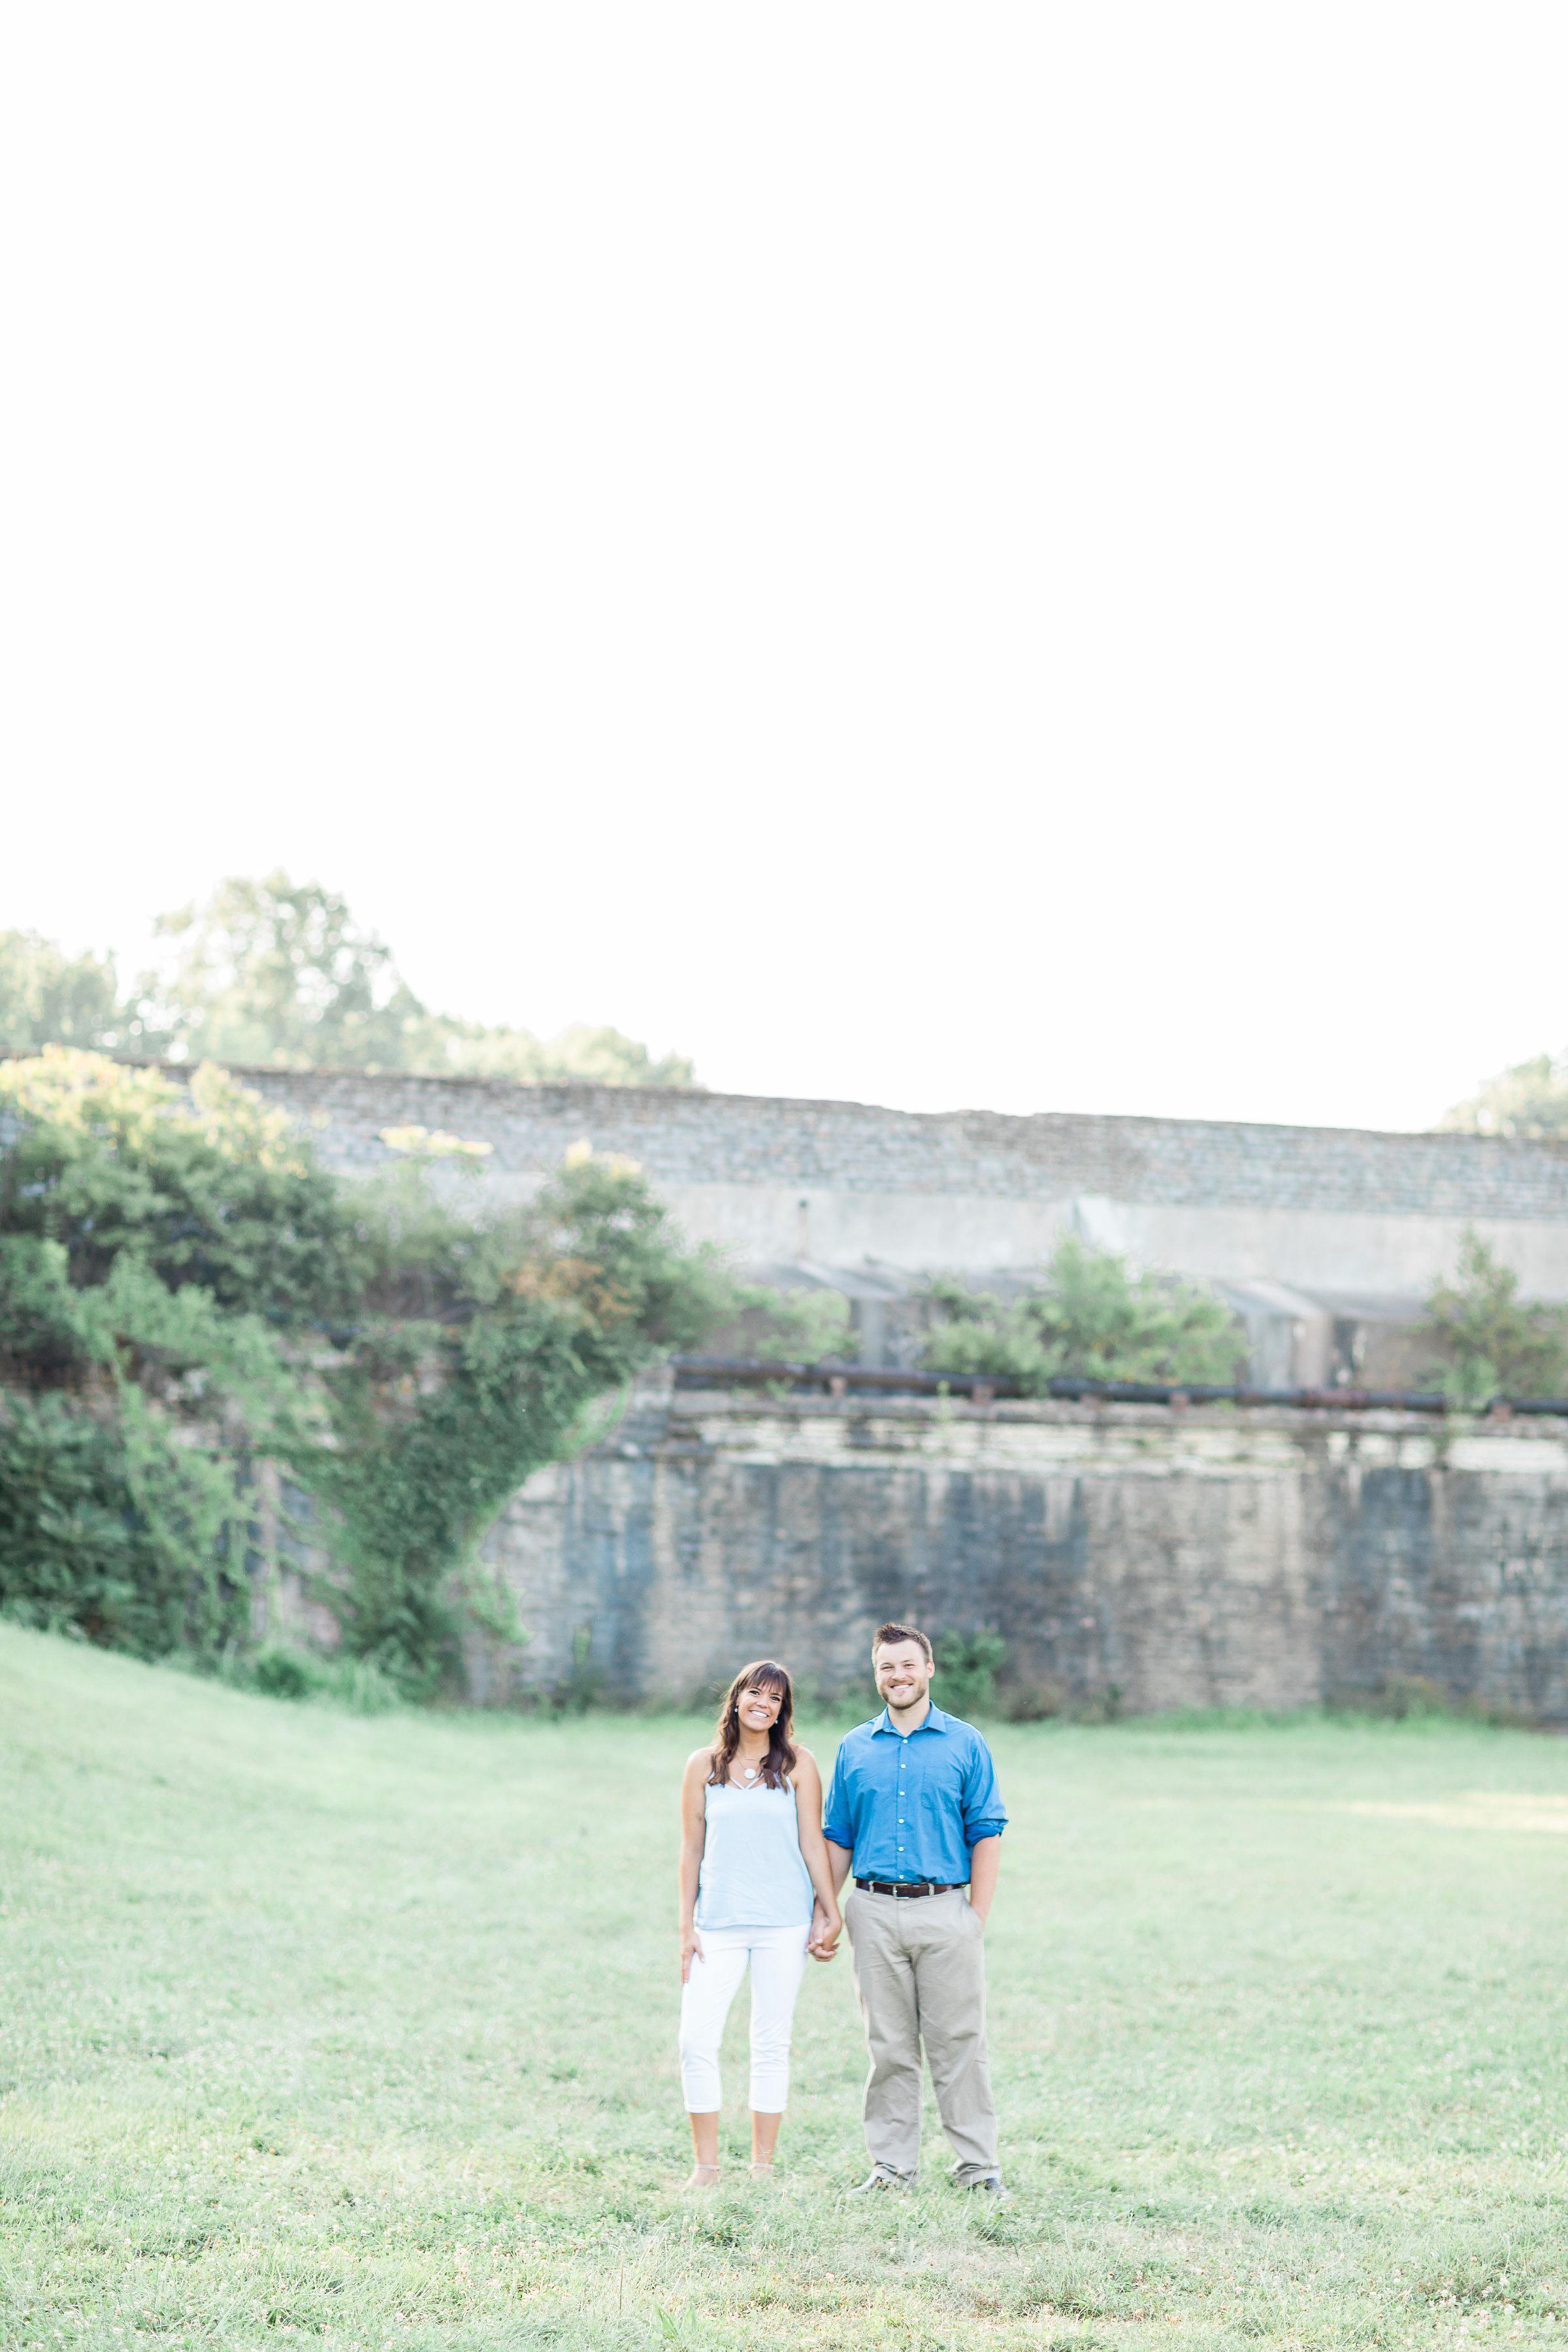 eden park engagement pictures cincinnati wedding photographer-3.jpg